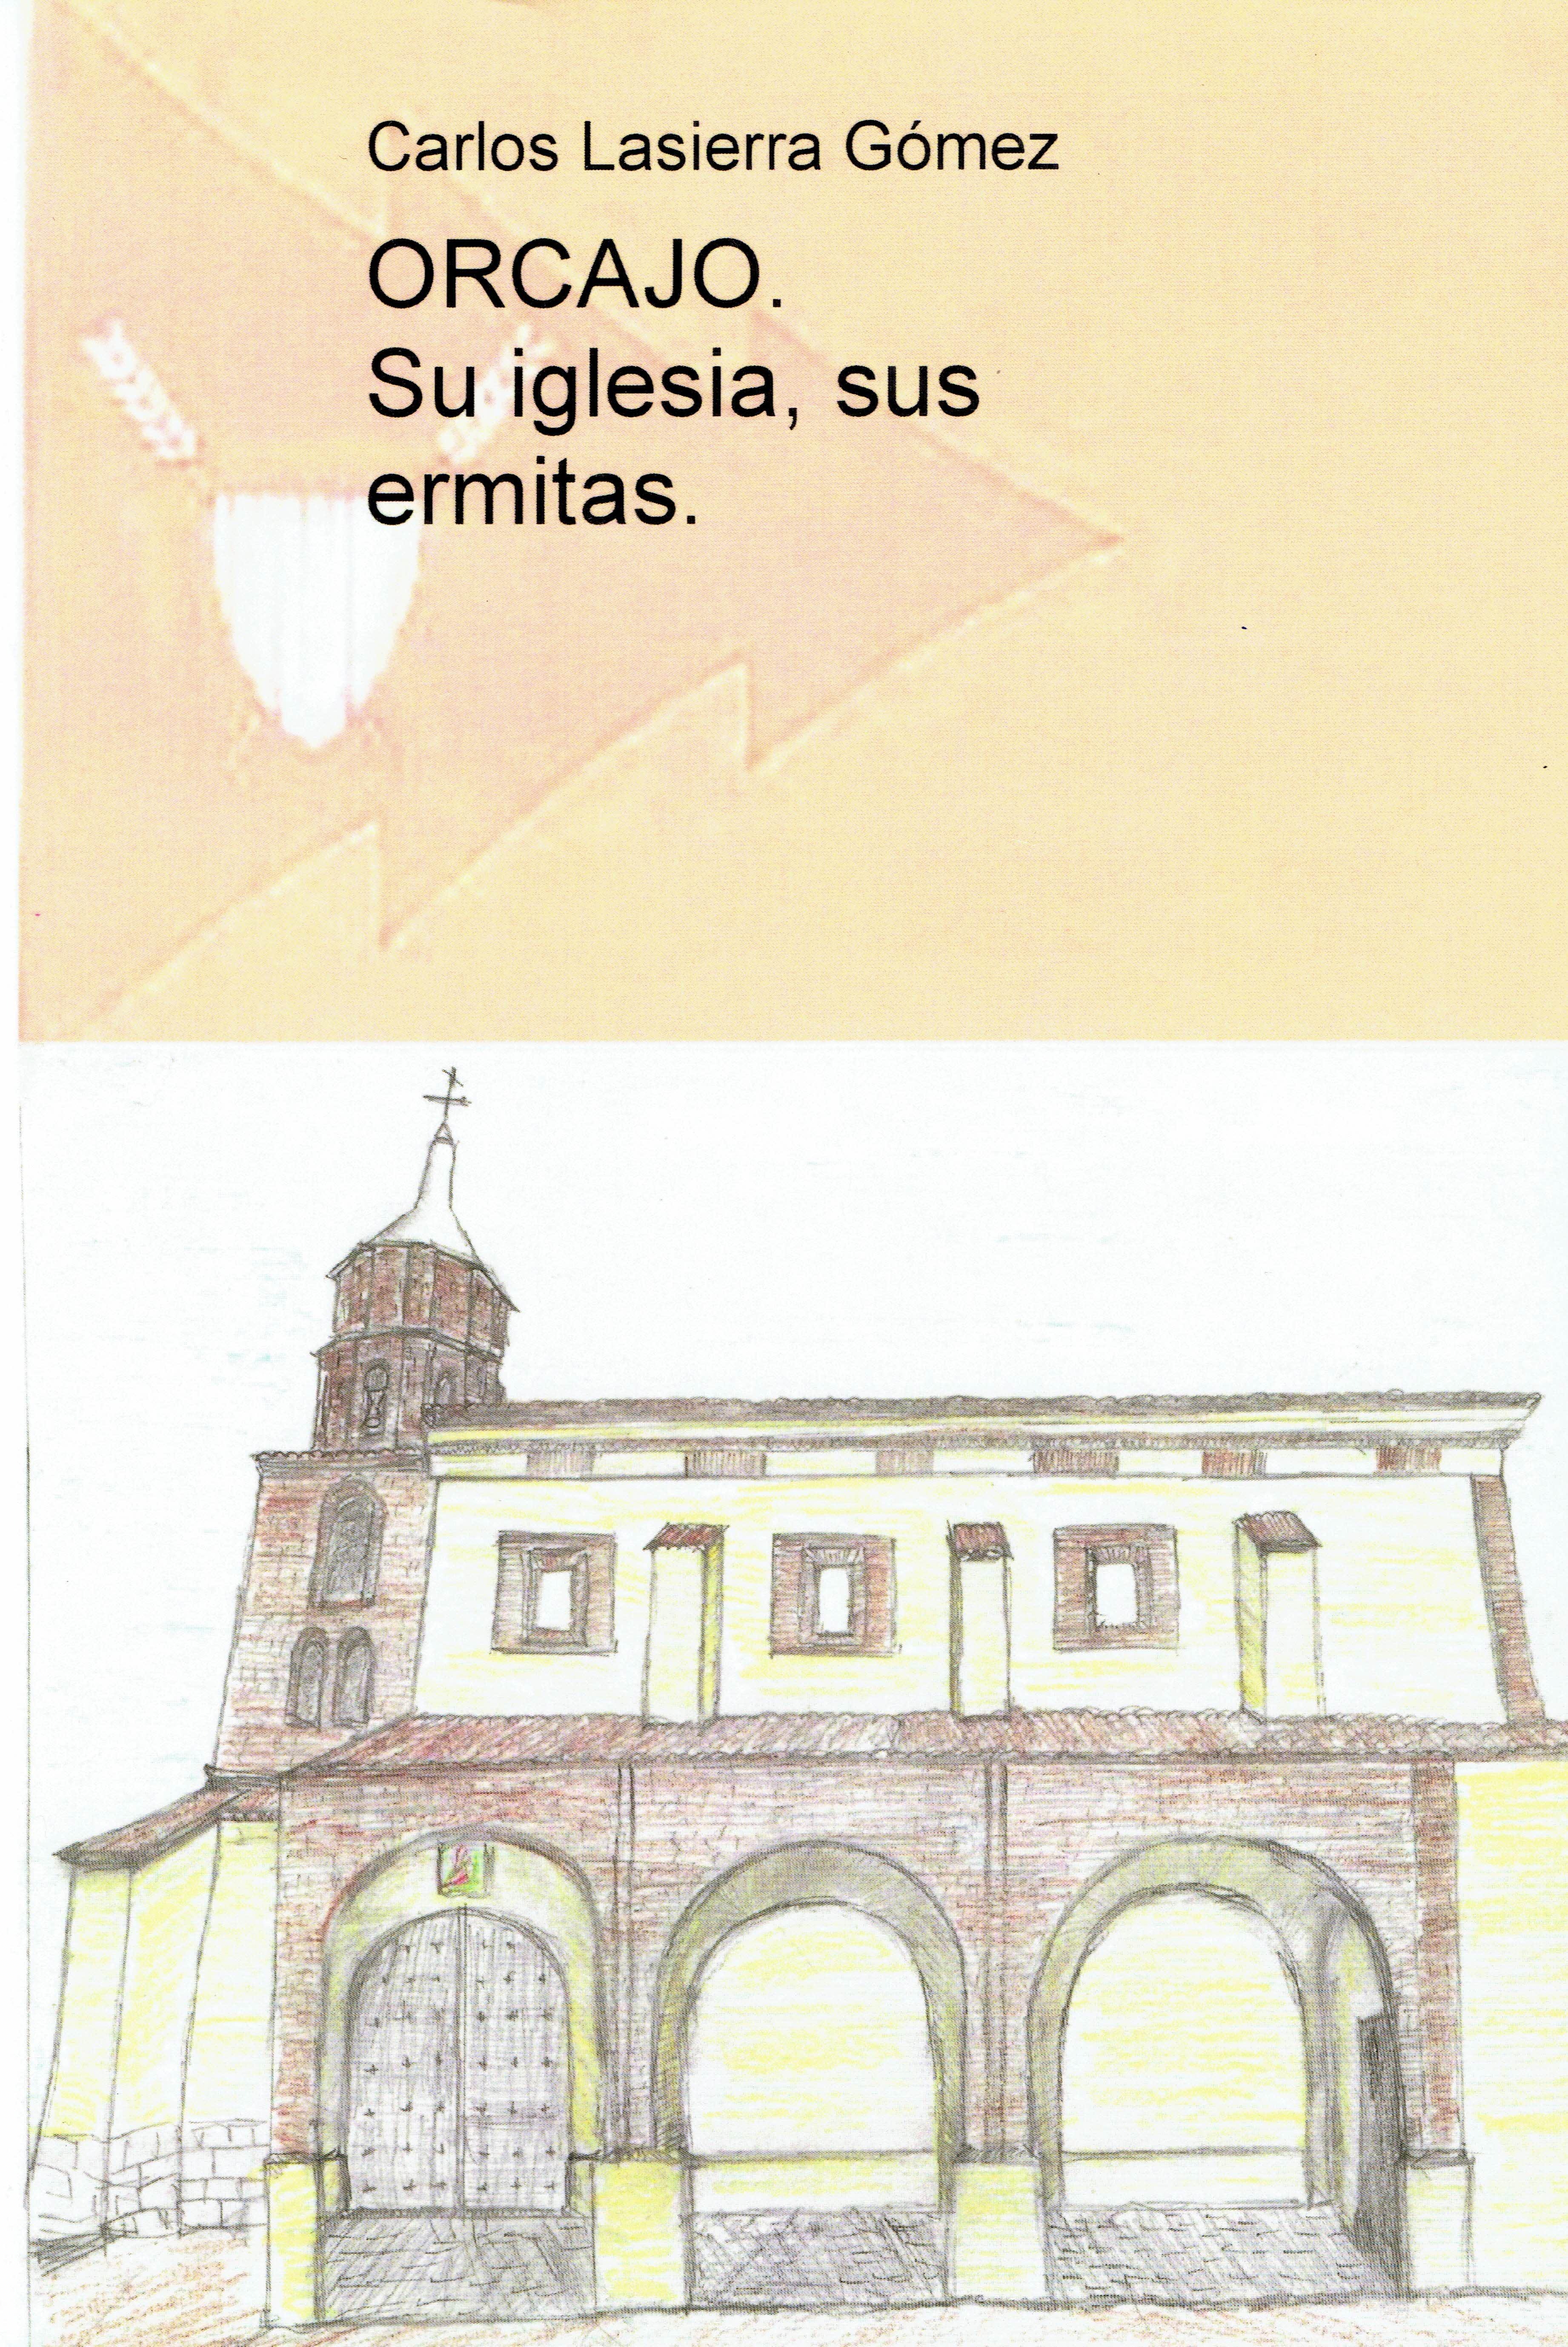 Orcajo, su iglesia, sus ermitas